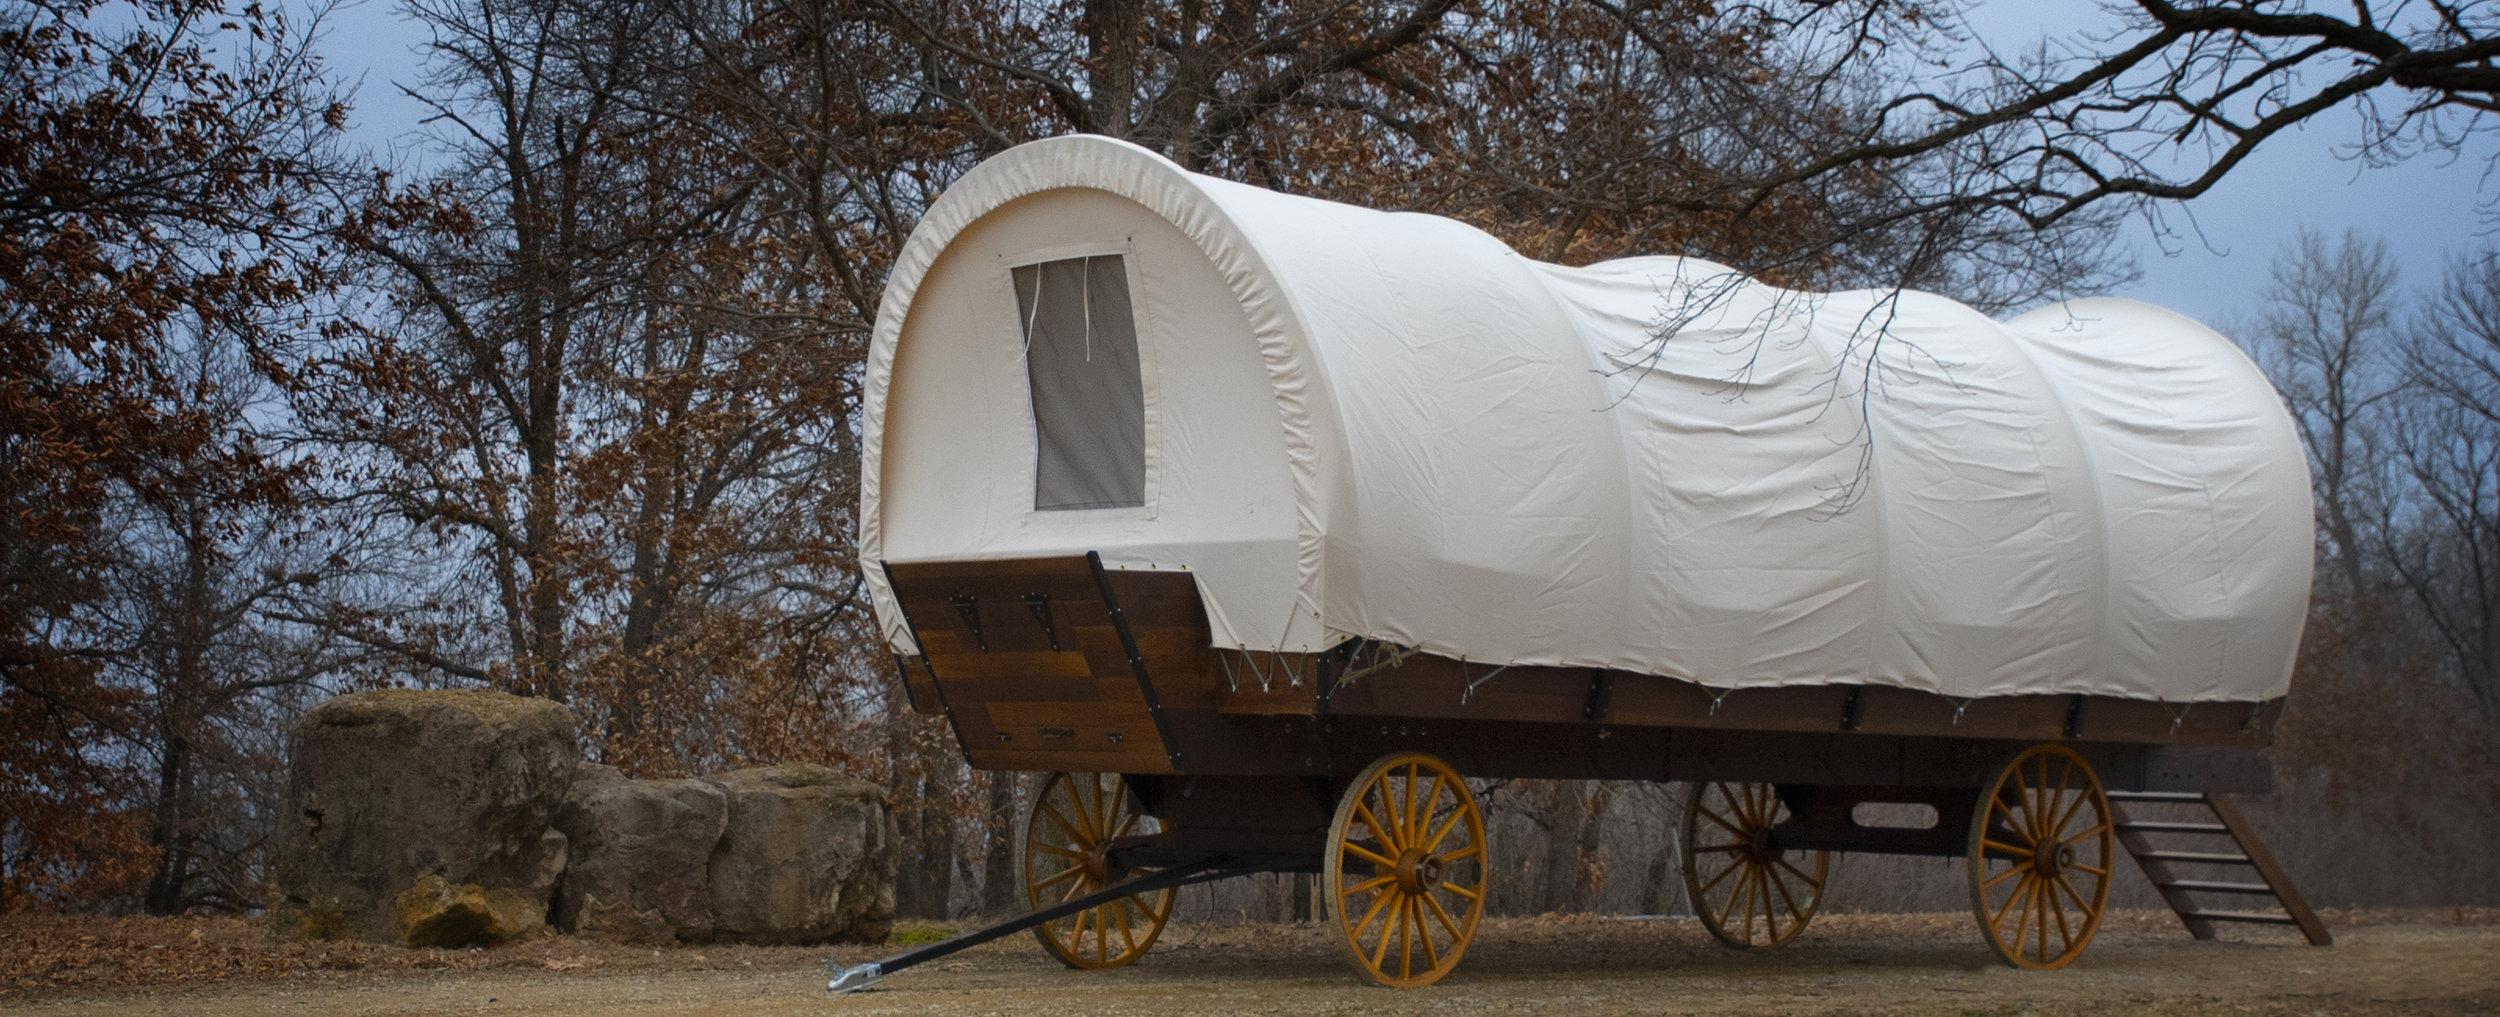 wagon-main_edited.jpg